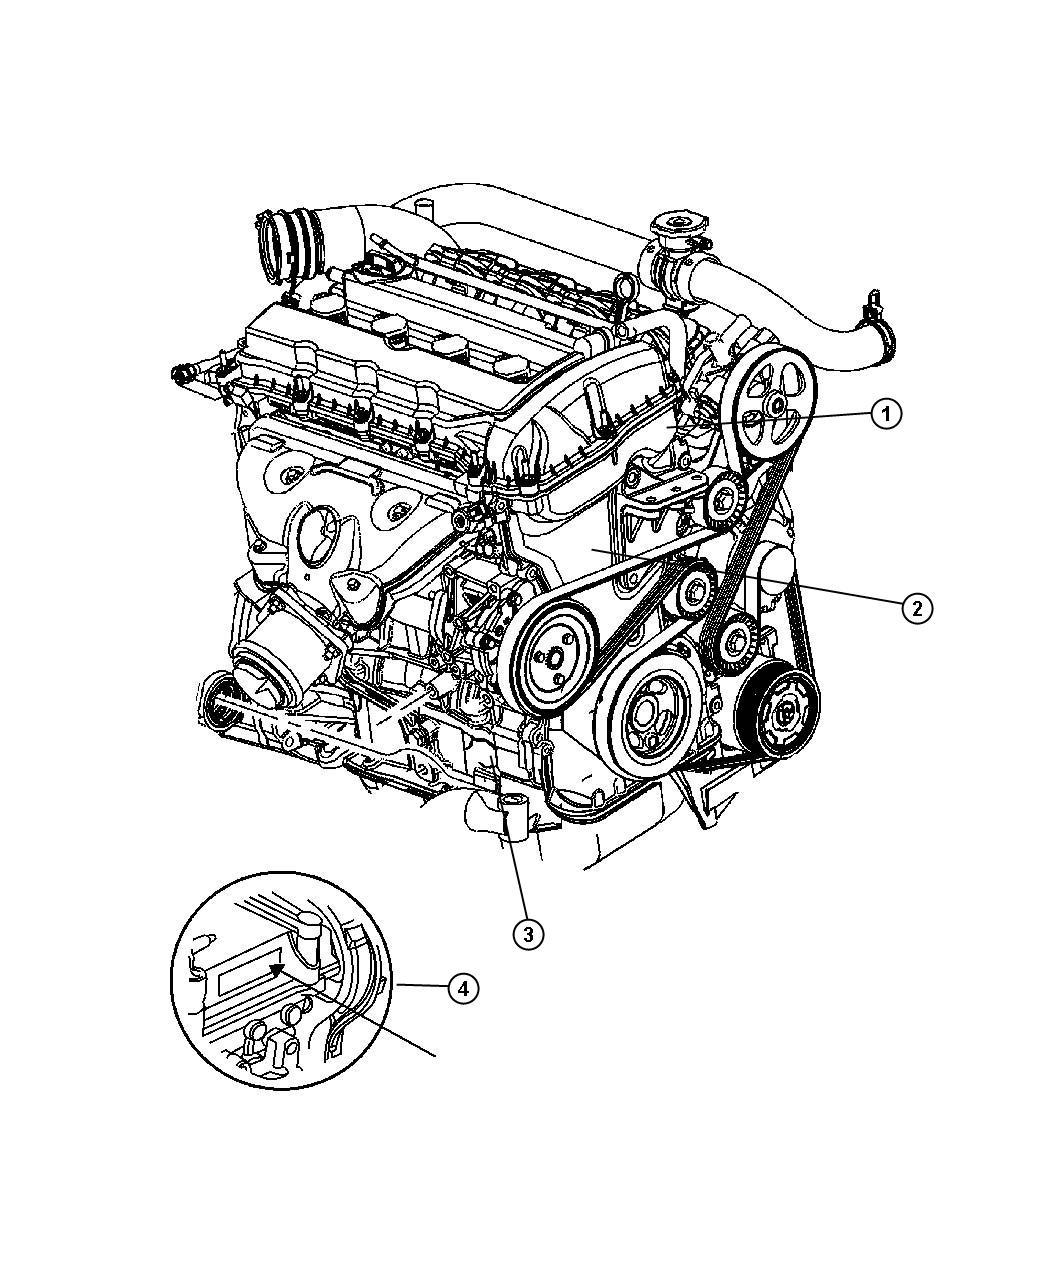 2009 Jeep Patriot Engine. Remanufactured. Long block